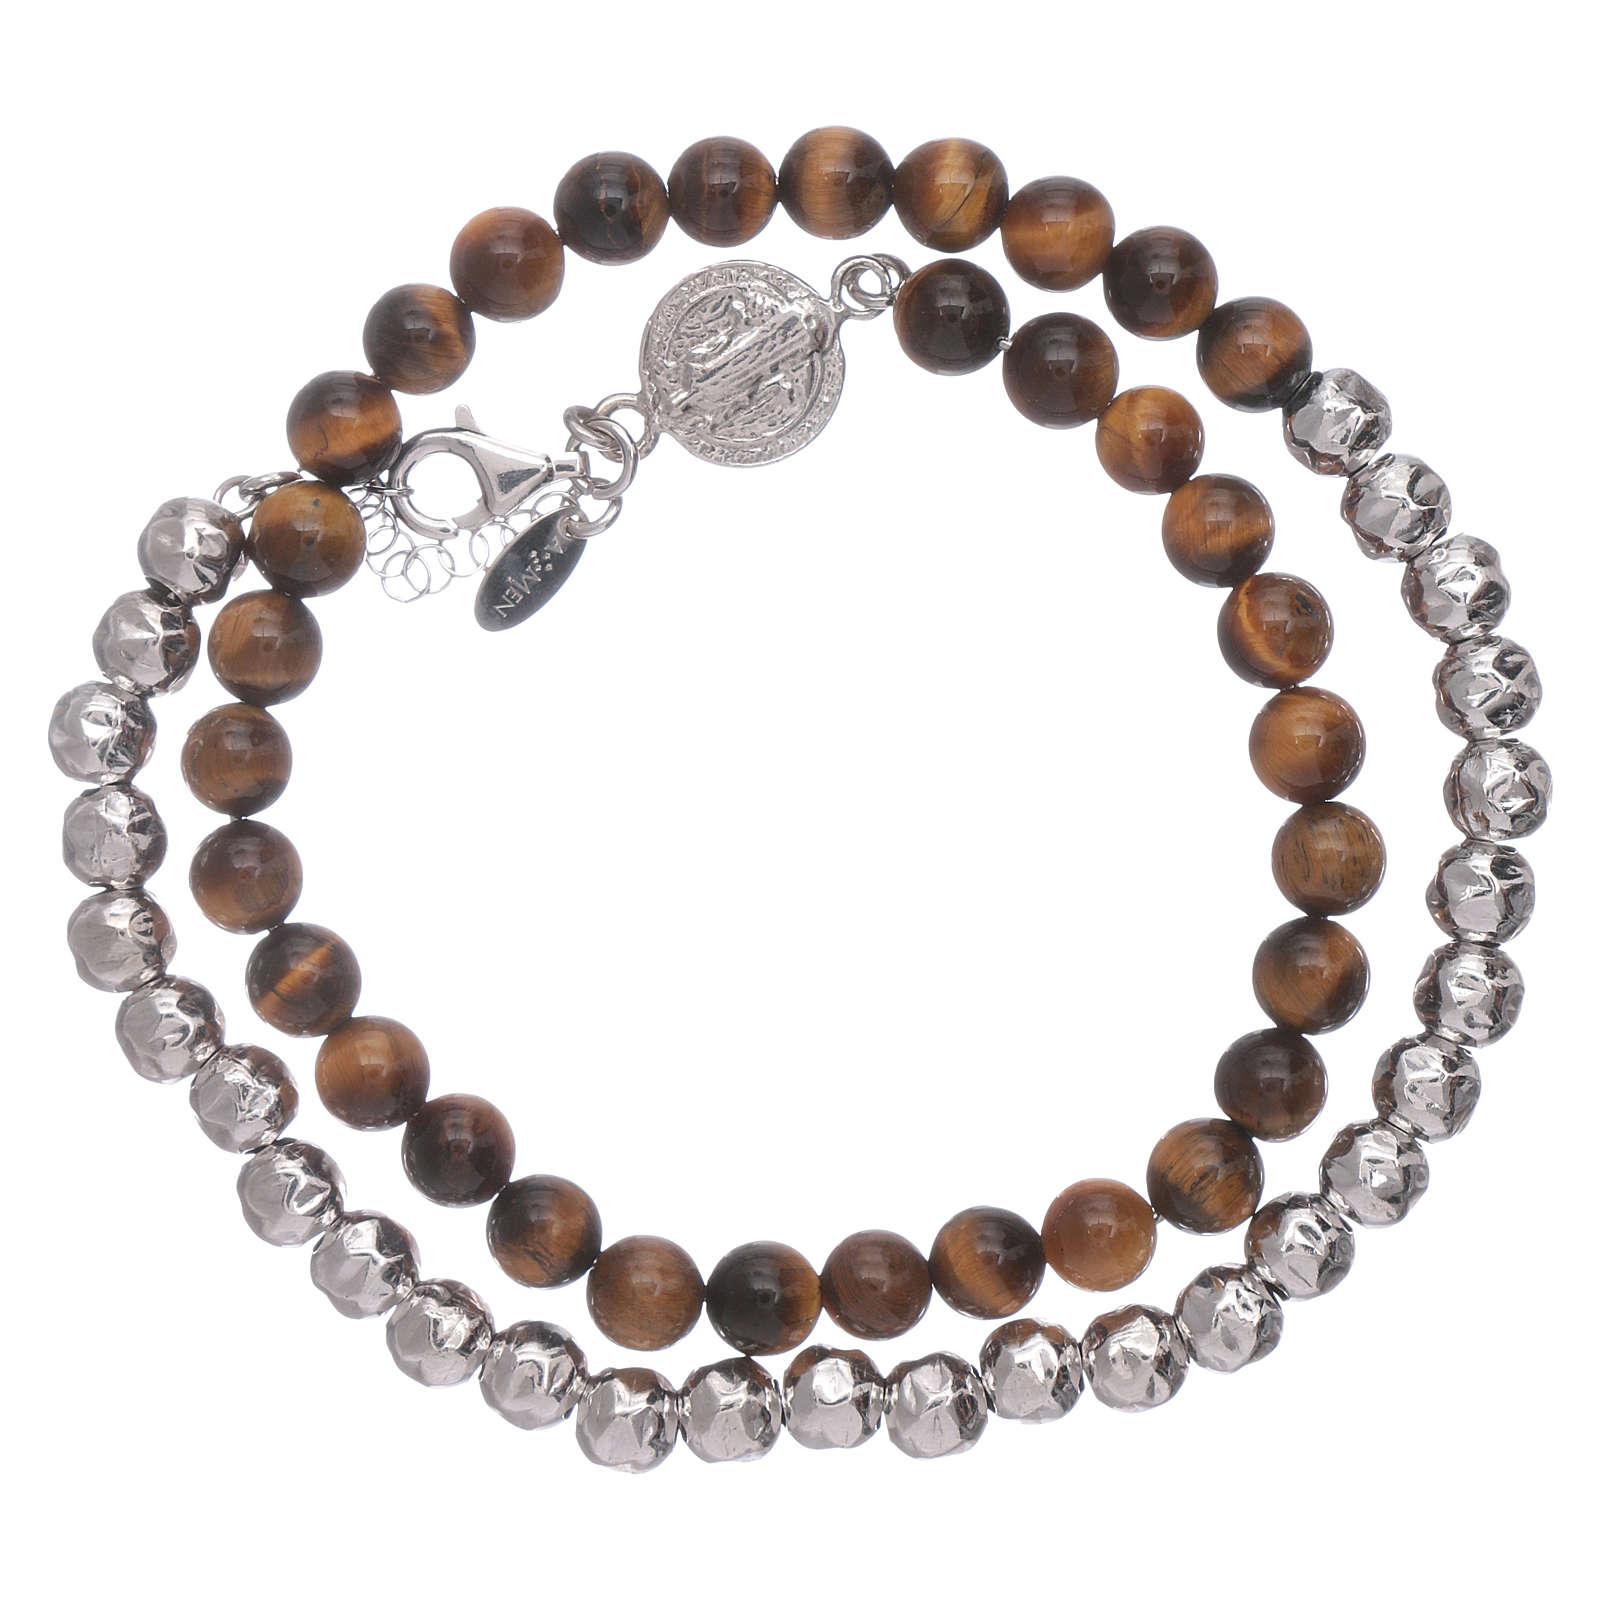 Bracelet unisex Saint Benoît AMEN oeil de tigre 4